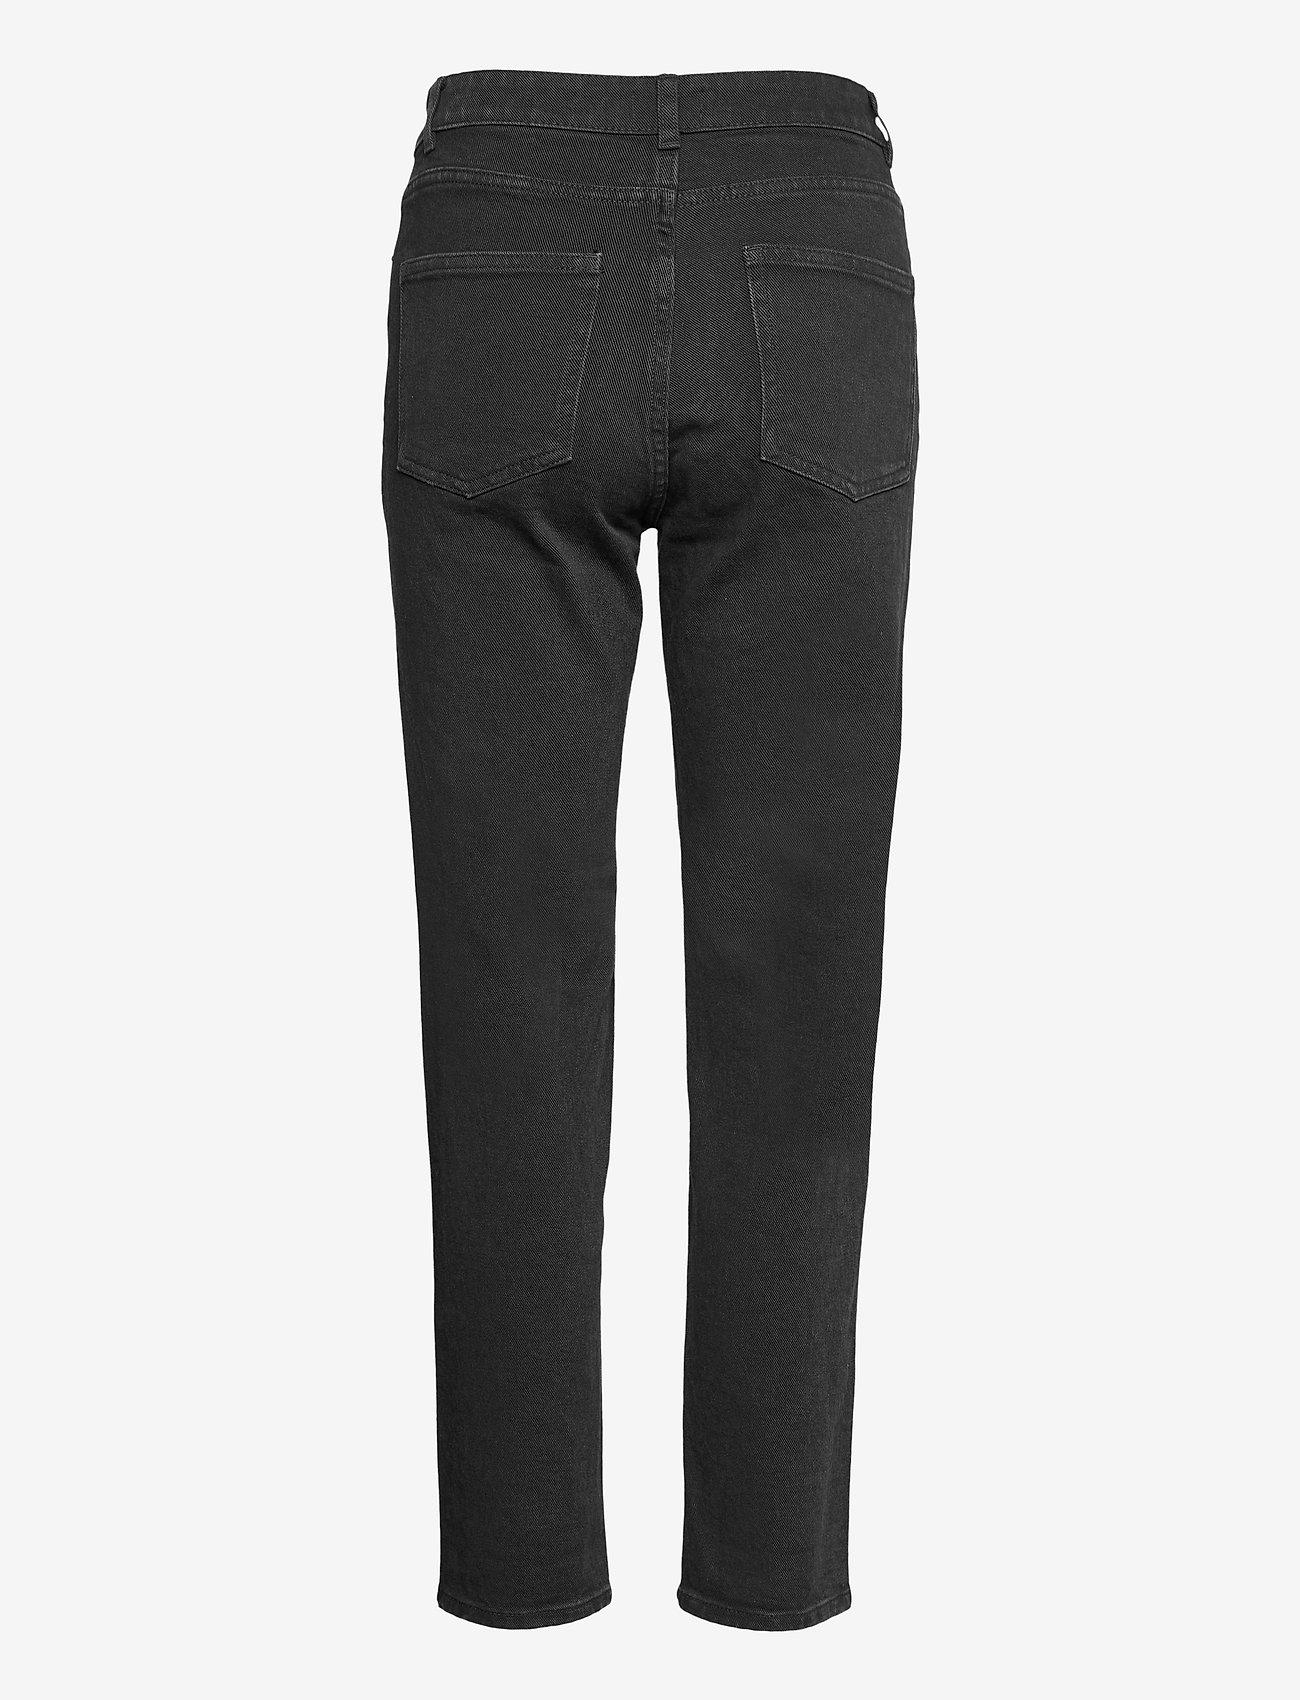 Lindex - Denim trousers Nea black - mom jeans - black - 1